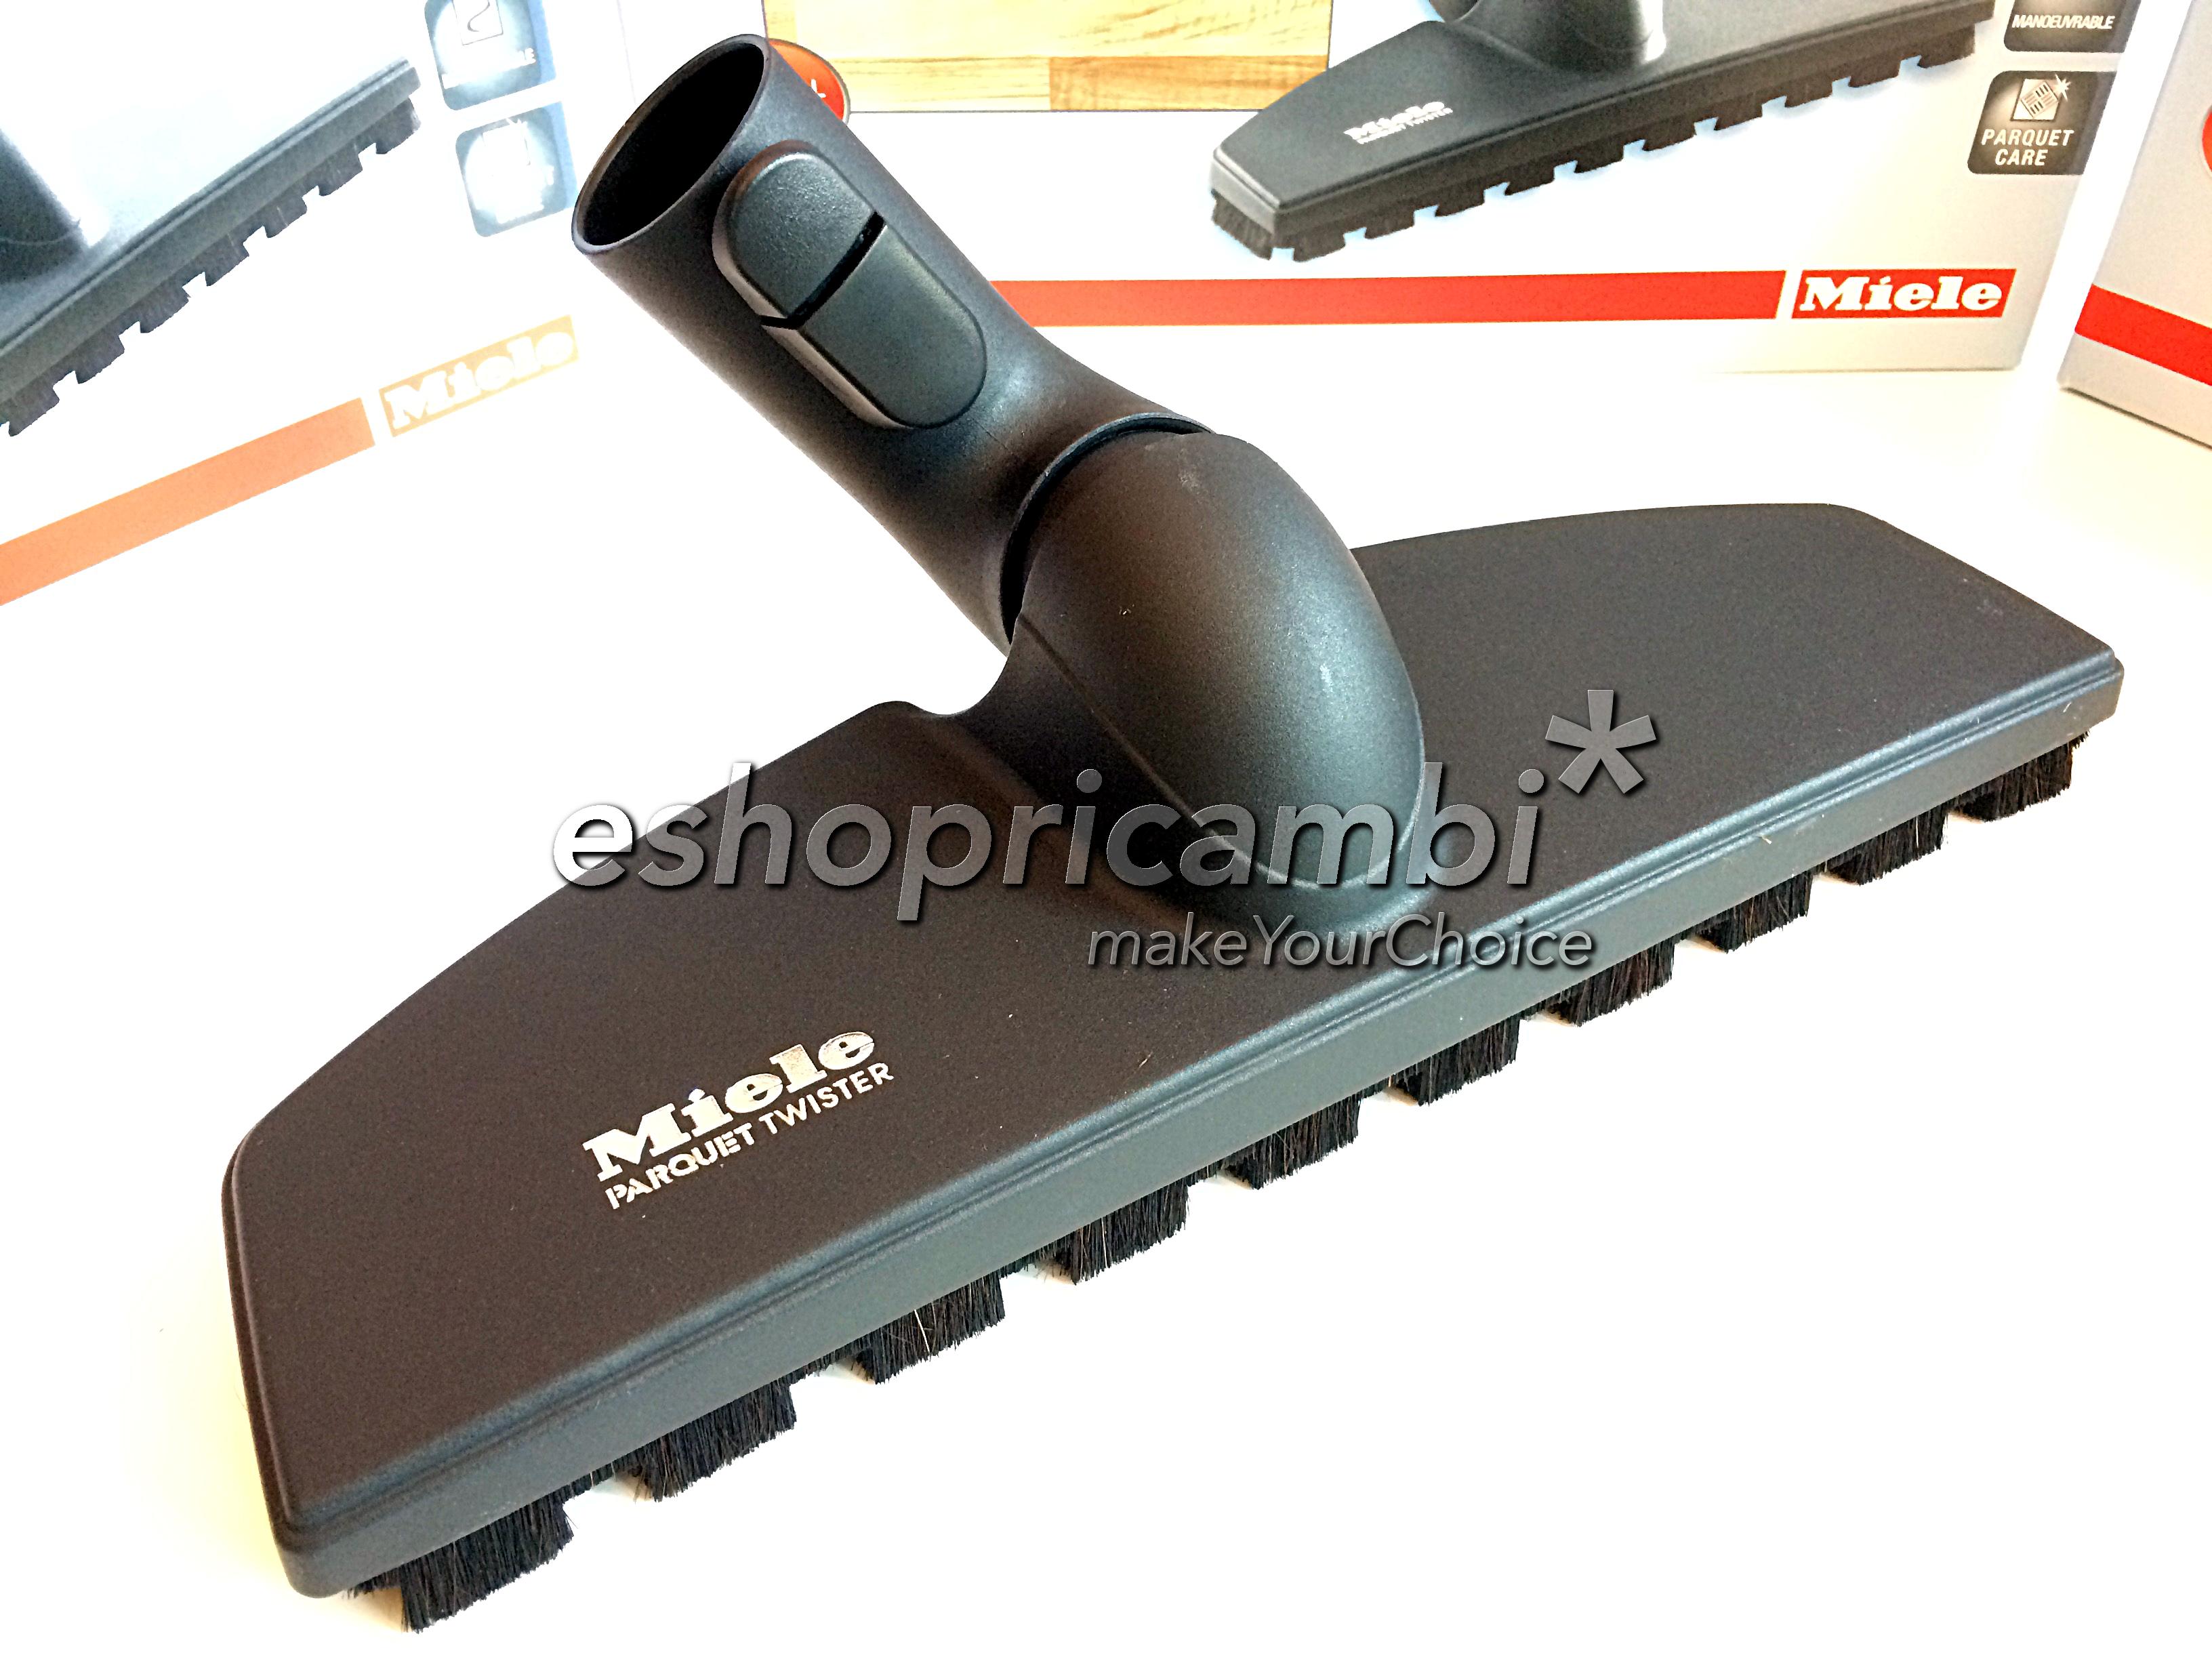 Cs, CAREservice IMG_5495-1 MIELE | Spazzola Parquet Twister Aspira Miele  SBB 300-3